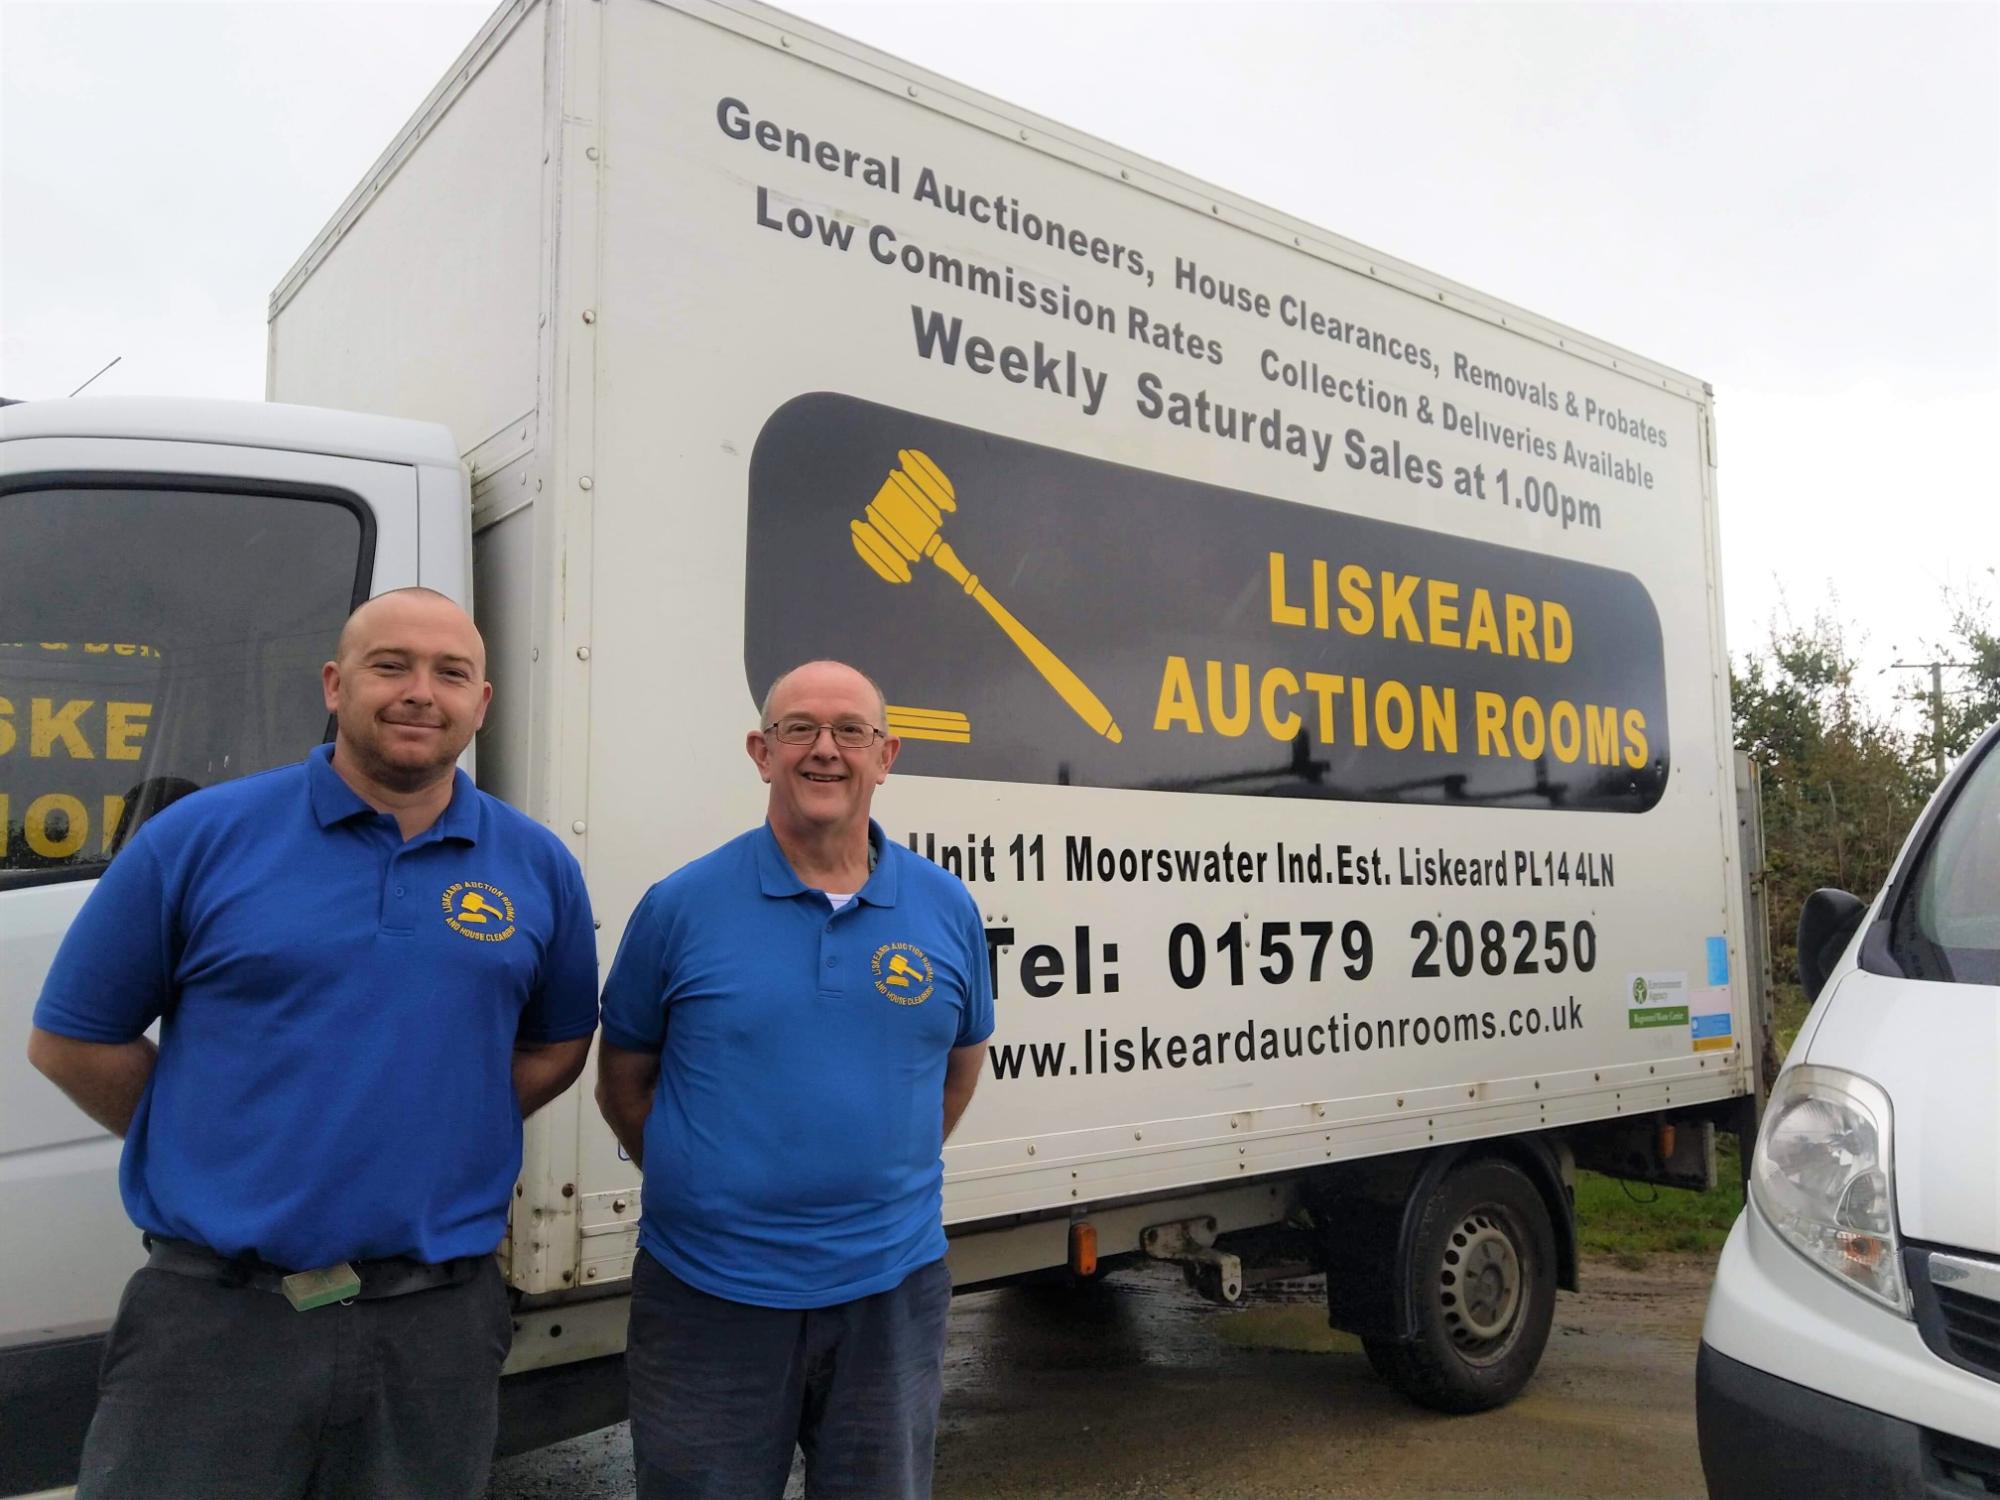 Liskeard Auction Rooms - The bosses